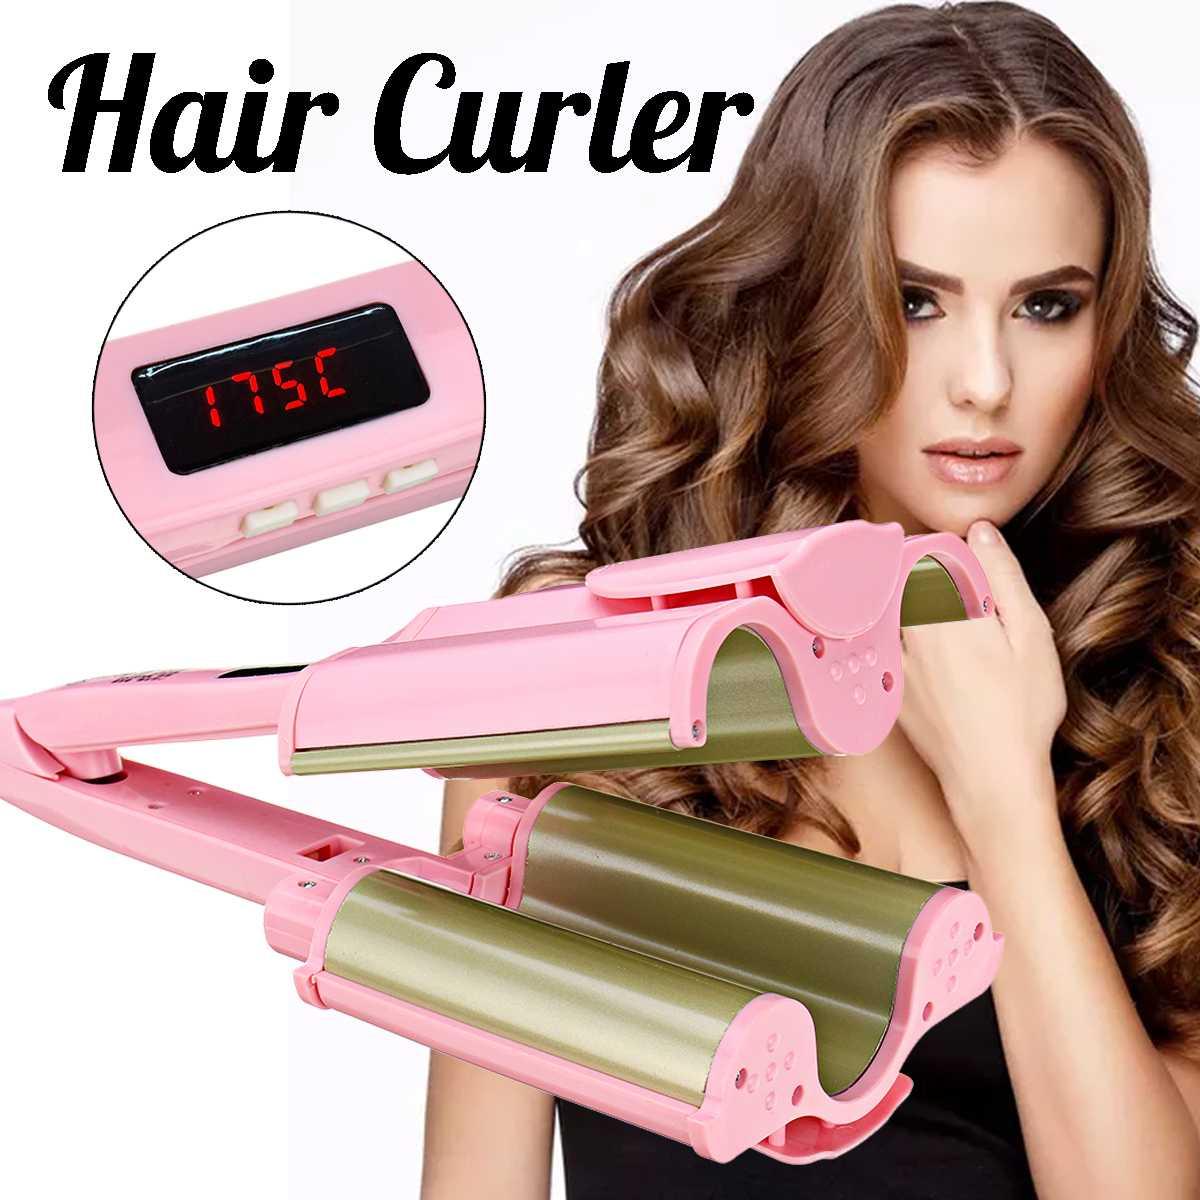 26mm/32mm Ceramic Three Tubes Hair Curlers Digital Display Big Wave Hair Waver Curling Irons Curler Quick Heat Hair Style Tool